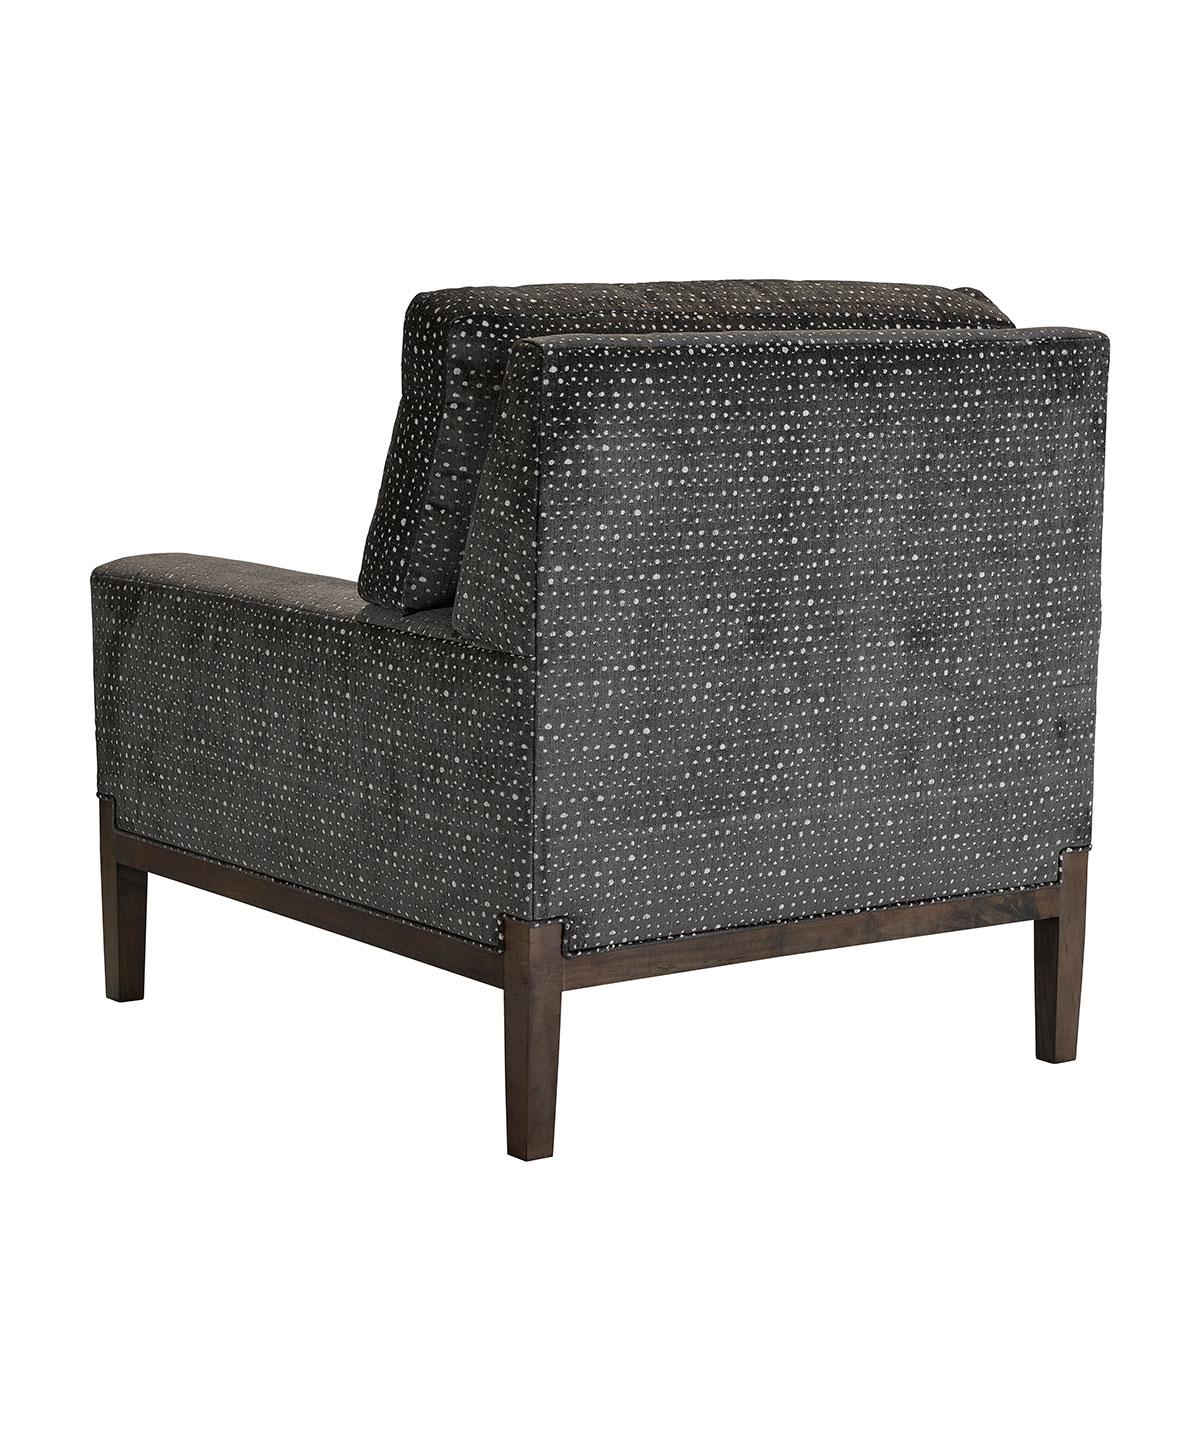 Averline Lounge Chair